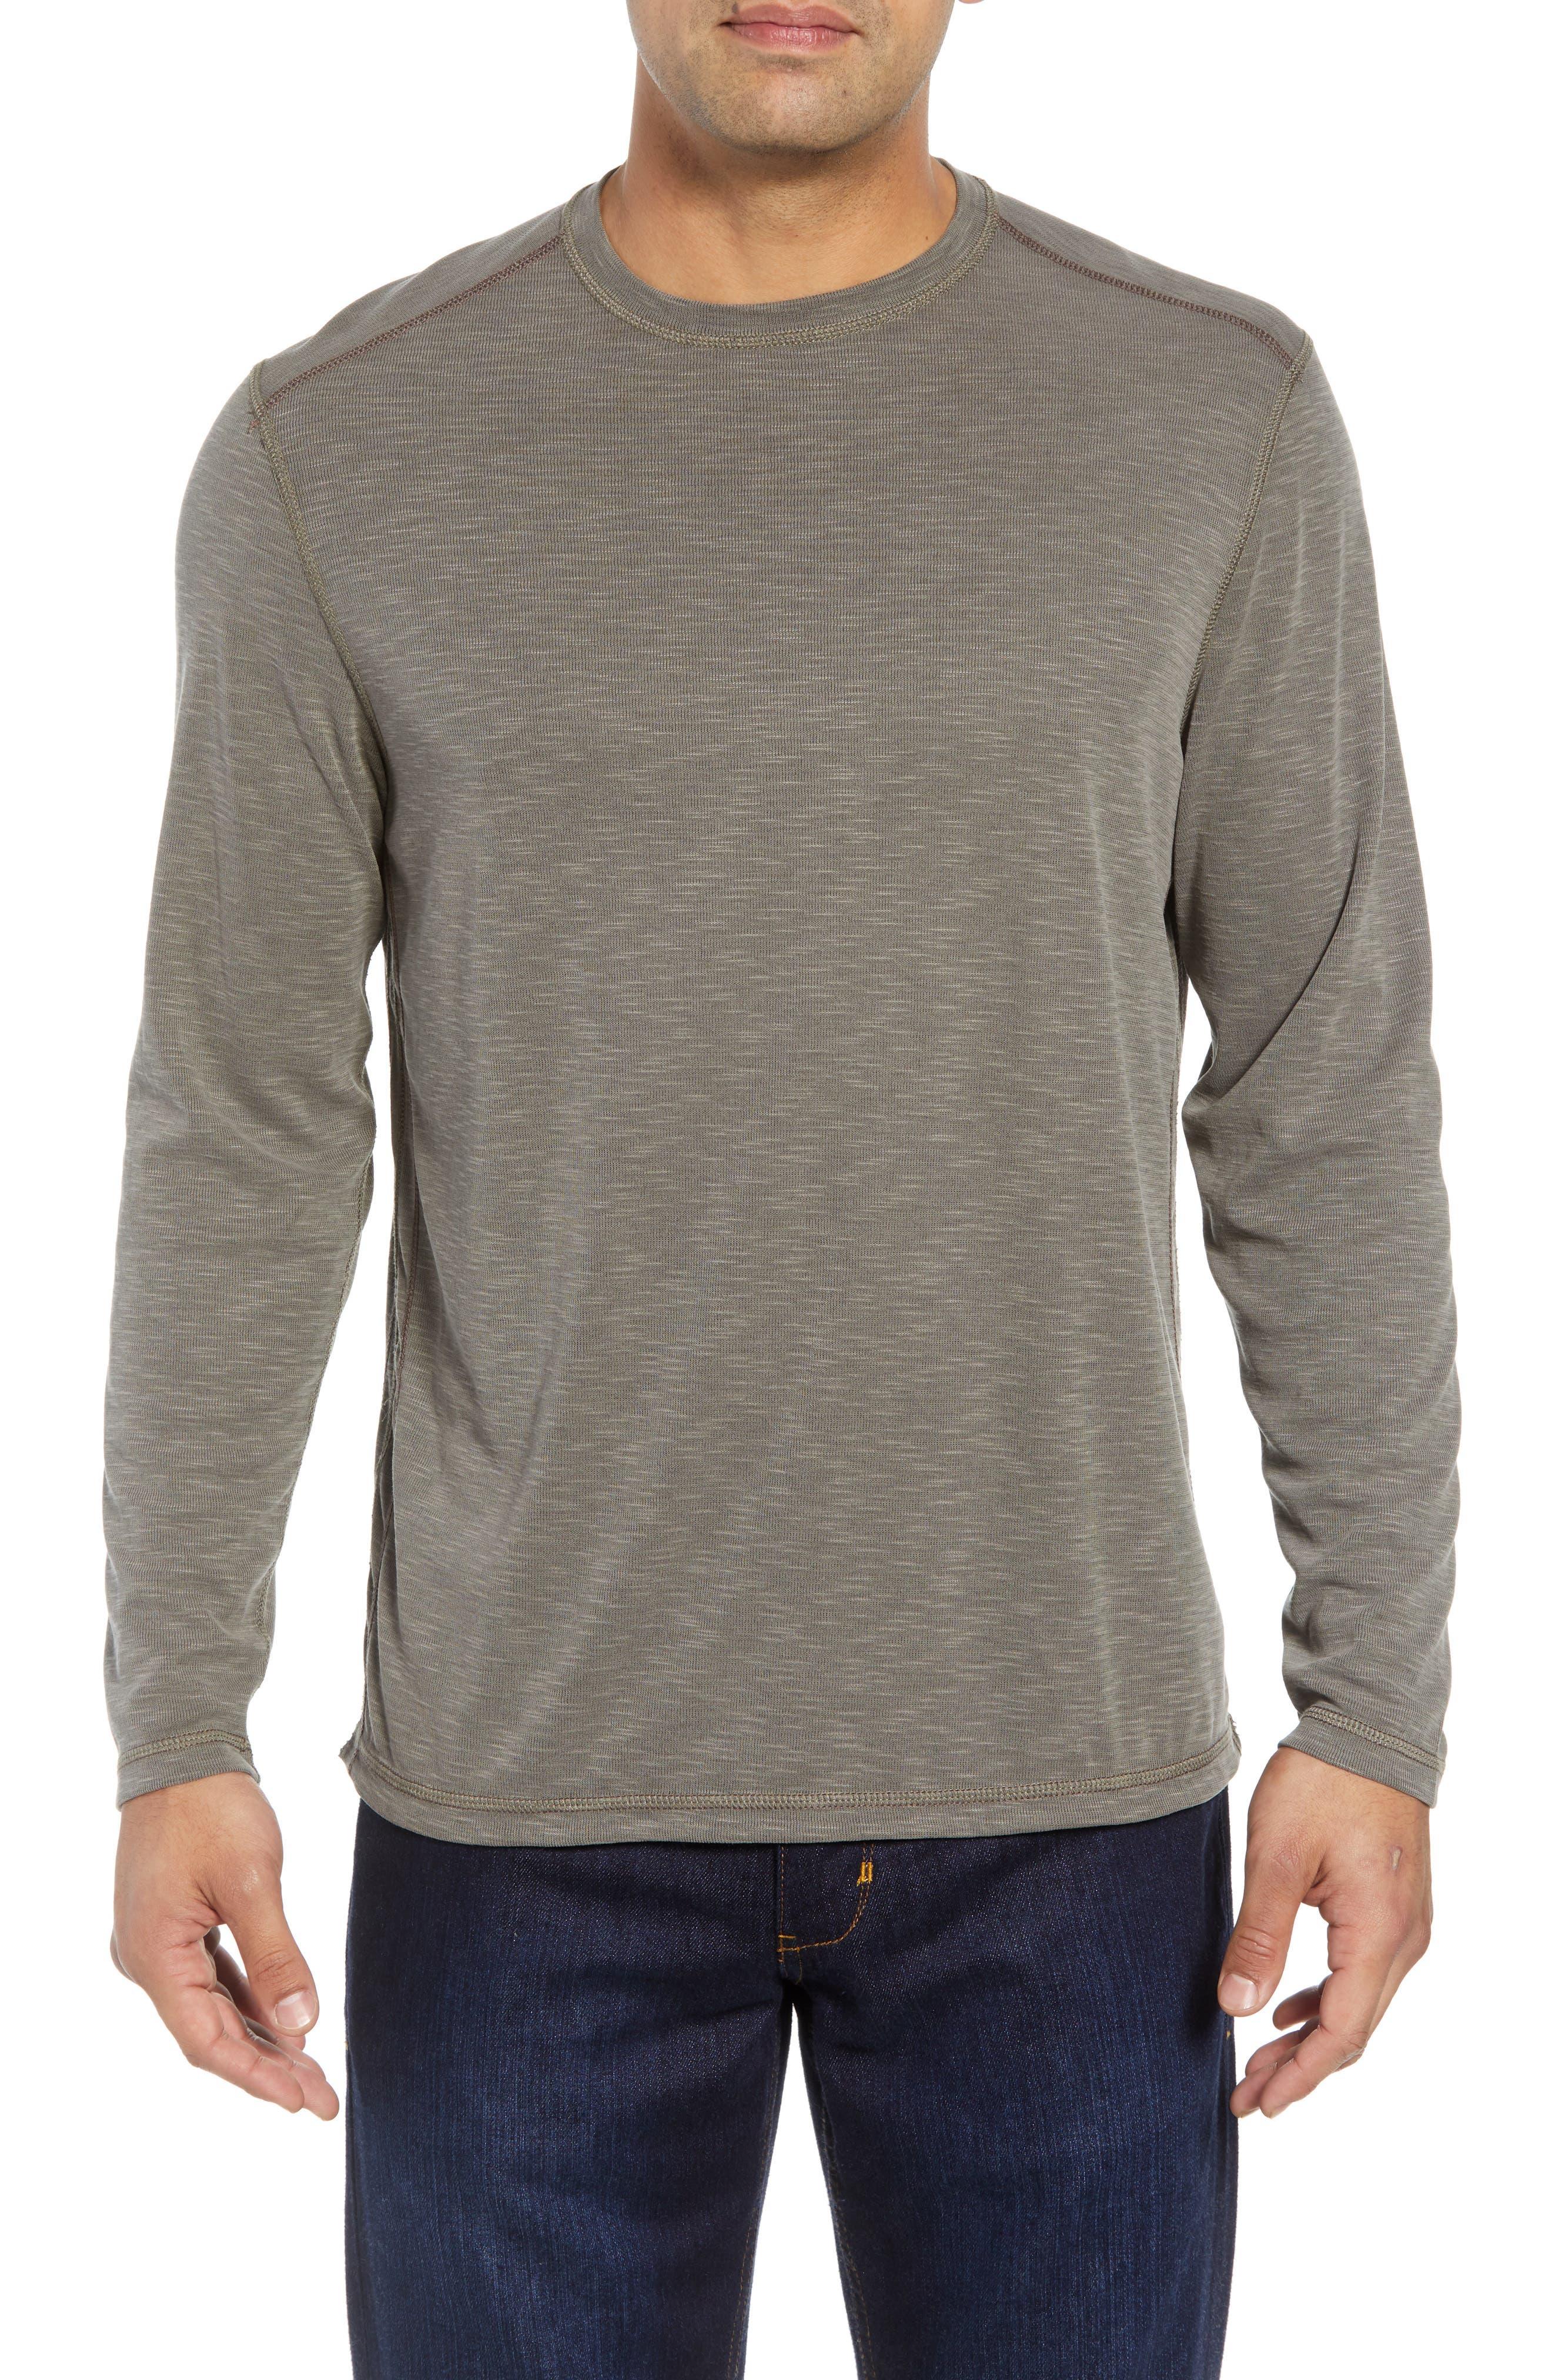 Flip Tide Standard Fit T-Shirt,                             Main thumbnail 1, color,                             BITTERSWEET CHOCOLATE